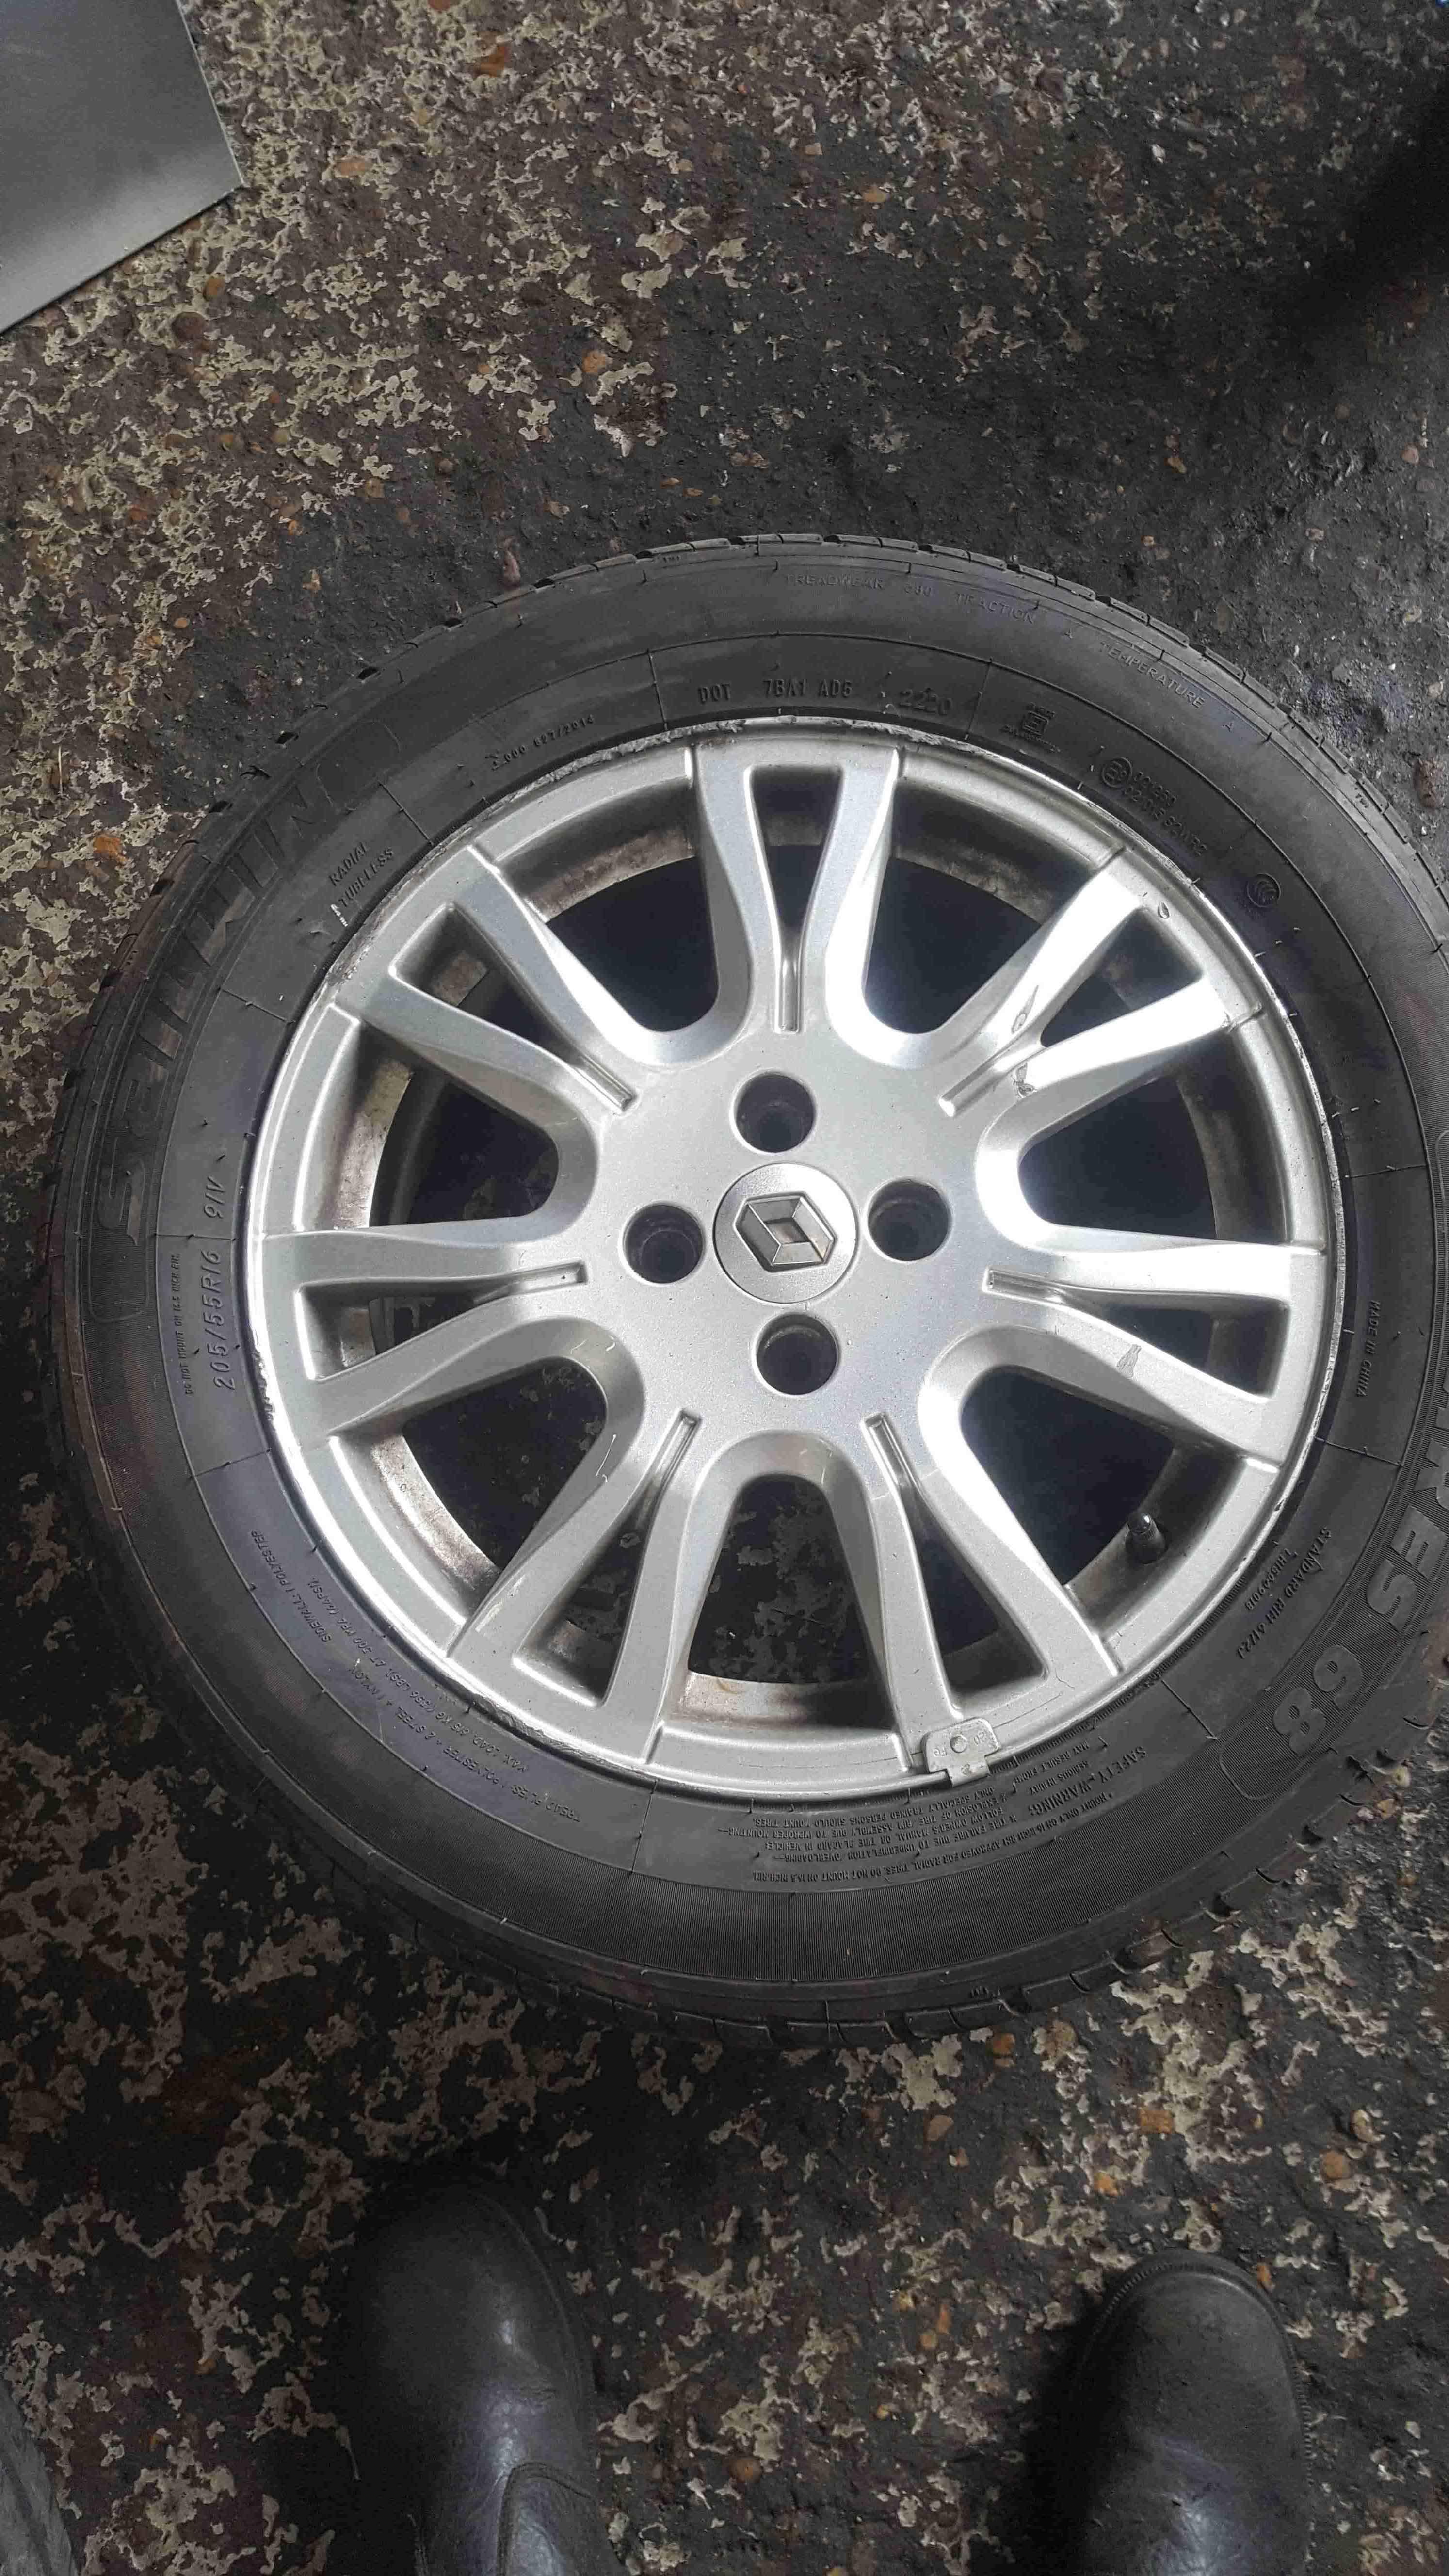 Renault Megane 2002-2008 Ozedia Alloy Wheel 16inch + Tyre 205 55 16 5mm Tread